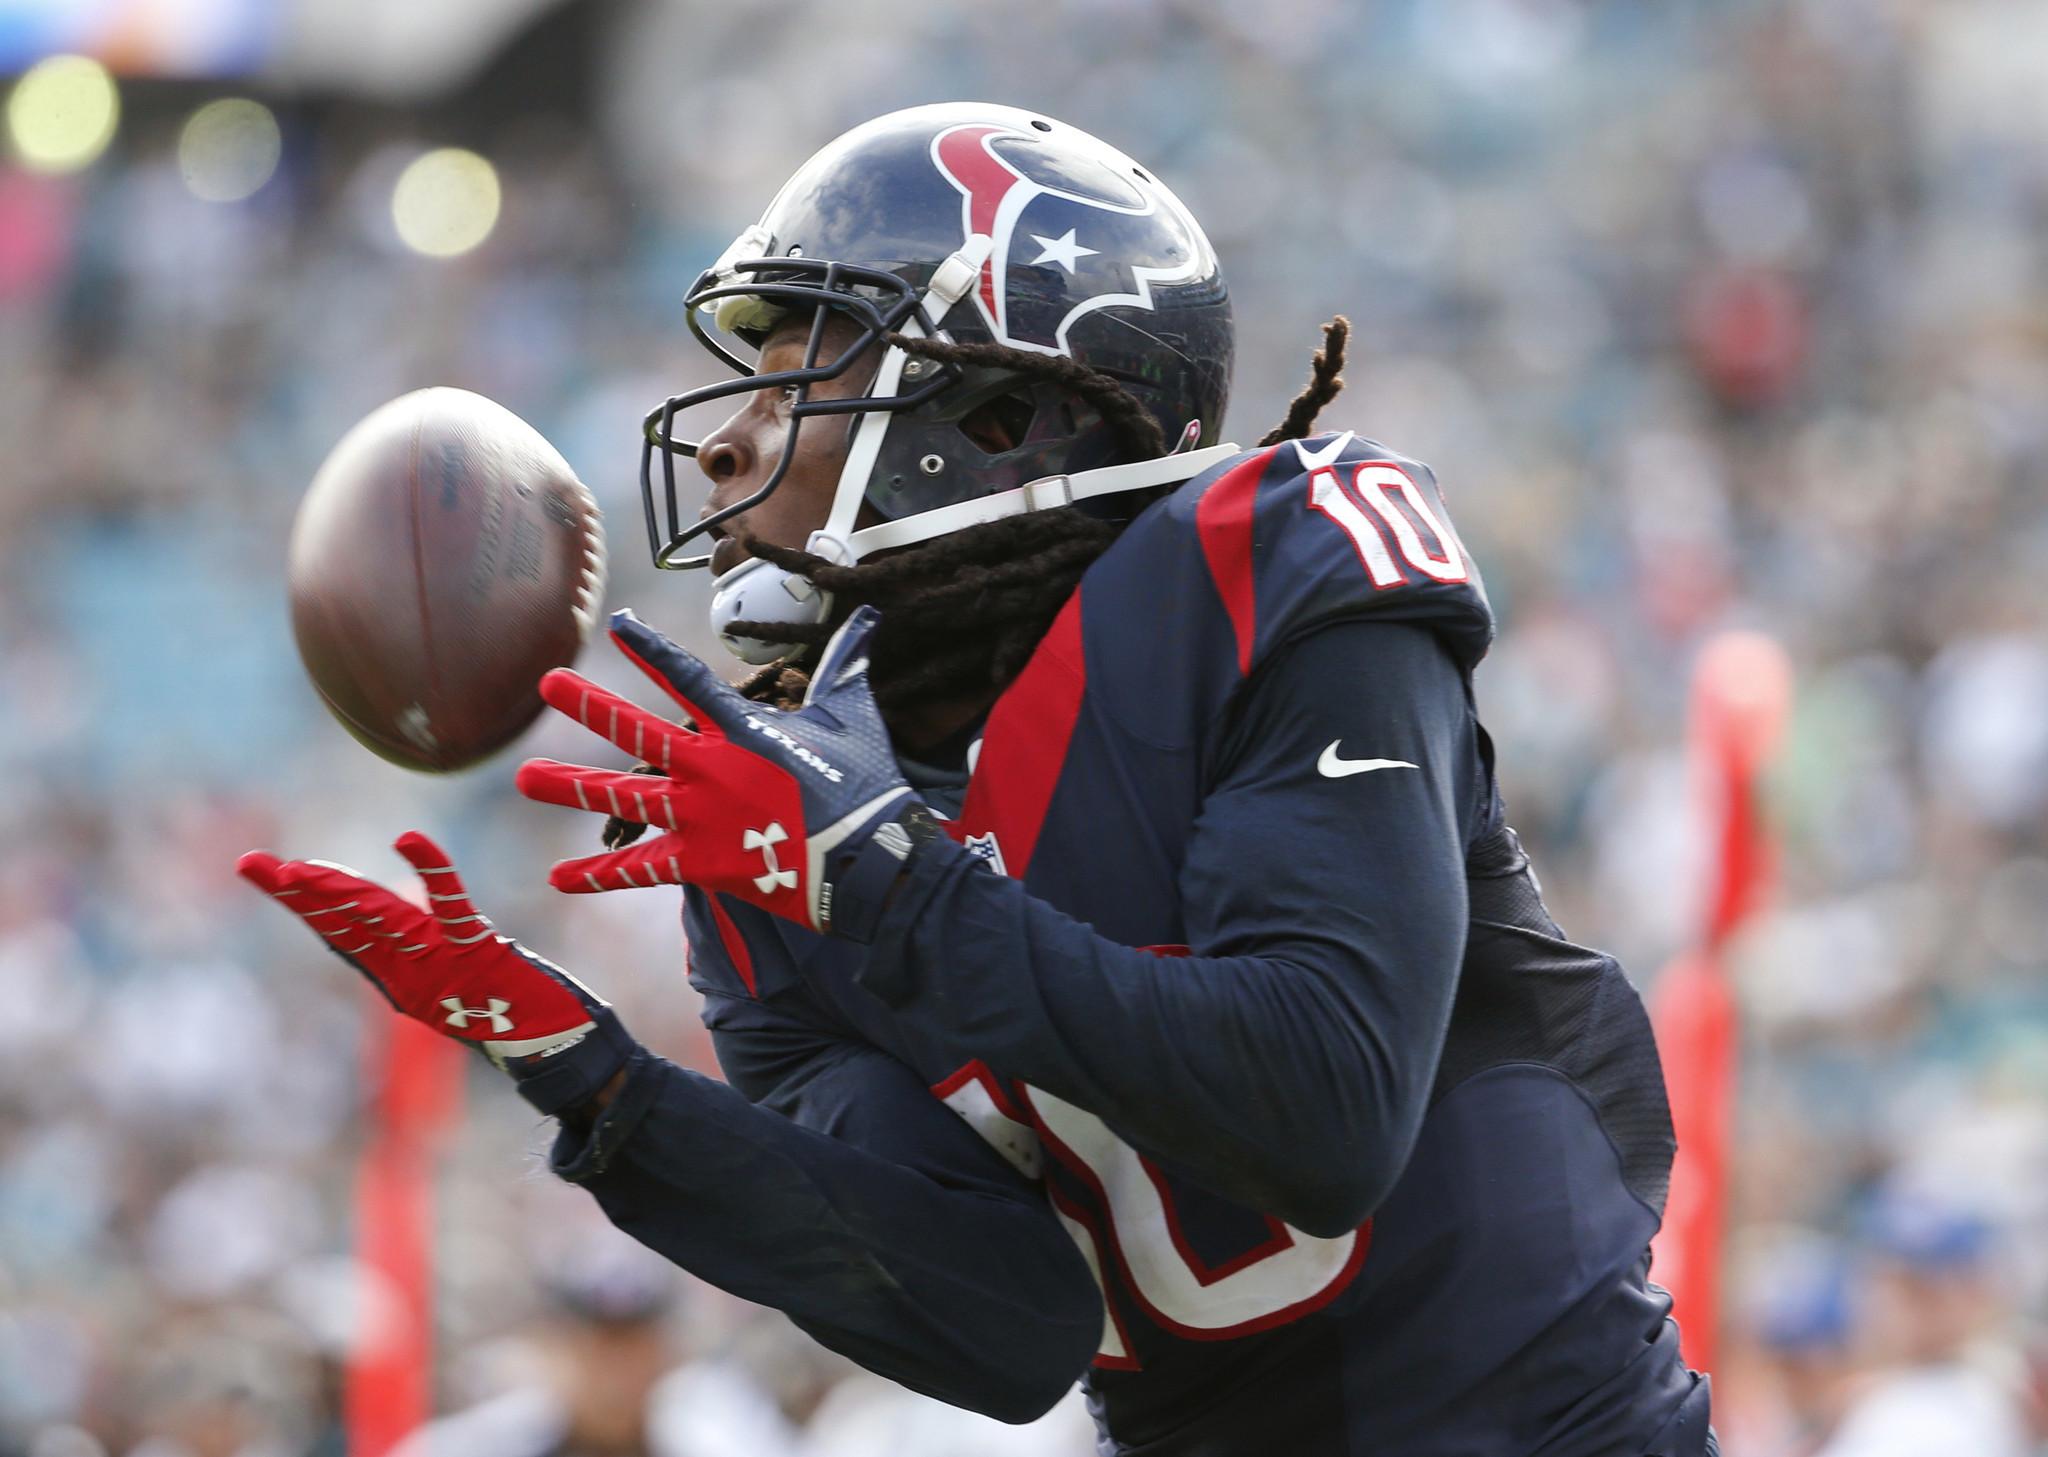 Bears secondary faces major challenge in Texans DeAndre Hopkins